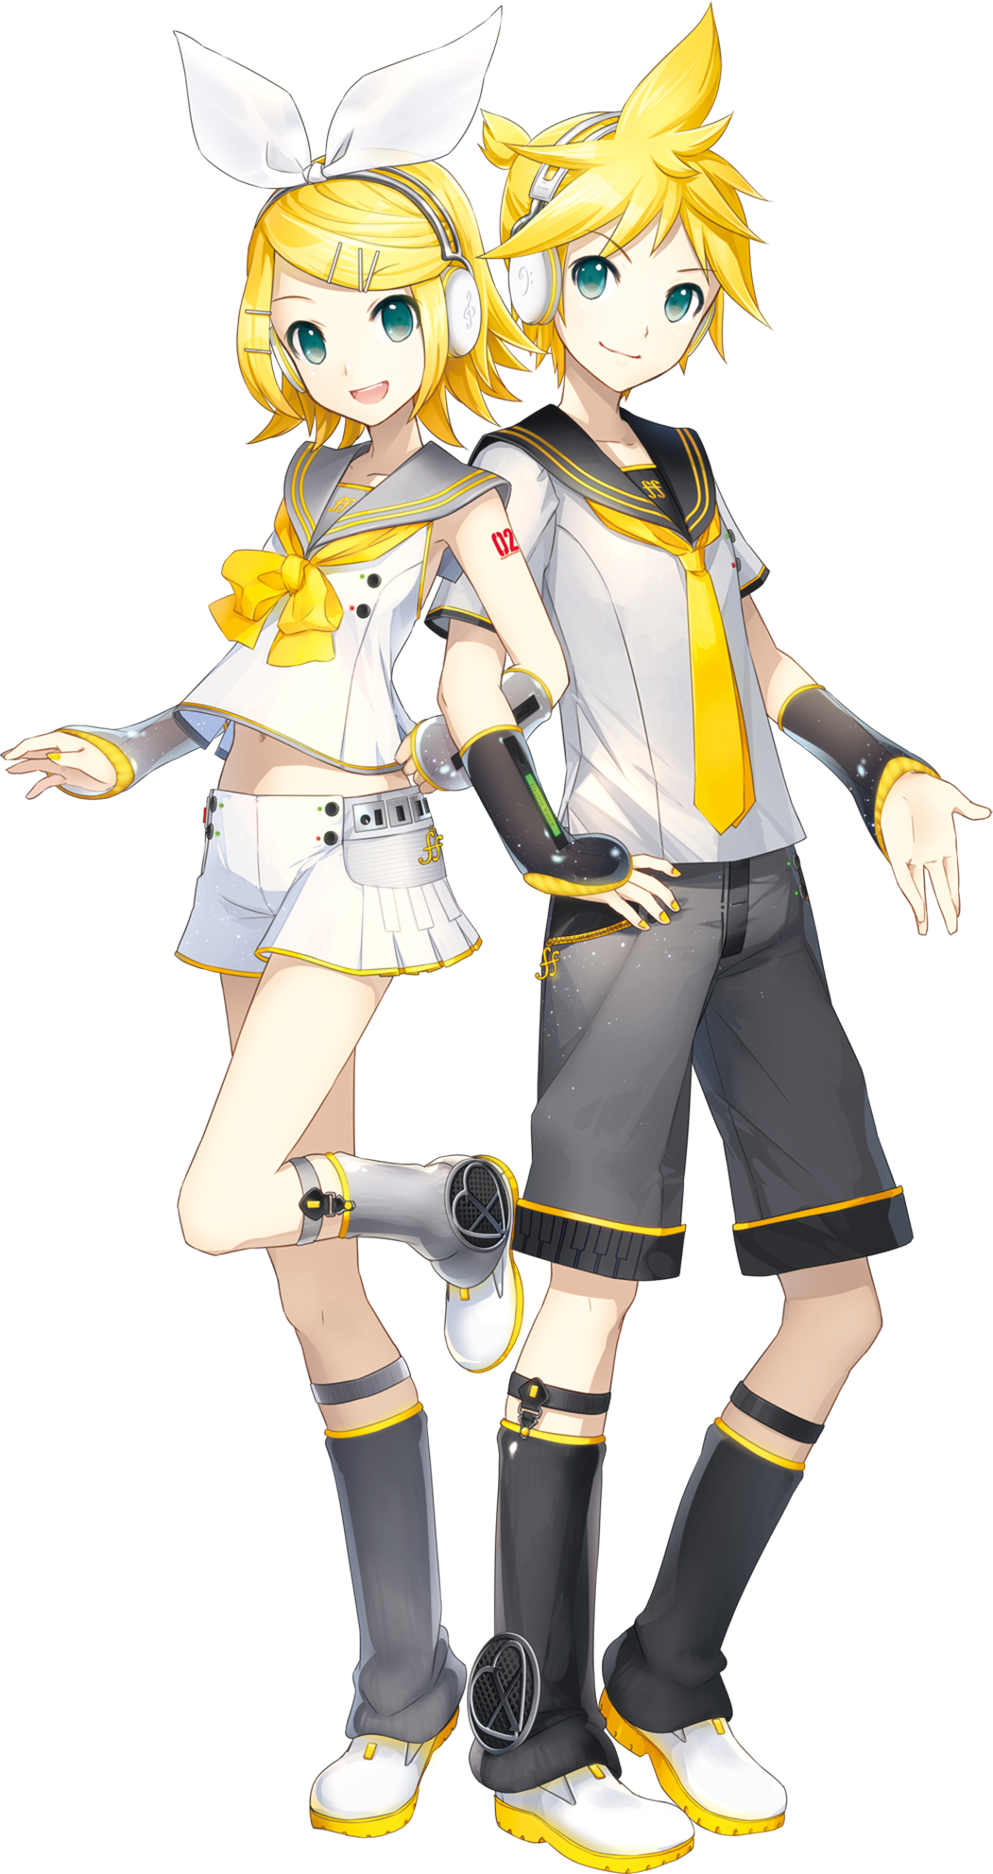 Kagamine Rin/Len   Vocaloid Wiki   Fandom powered by Wikia